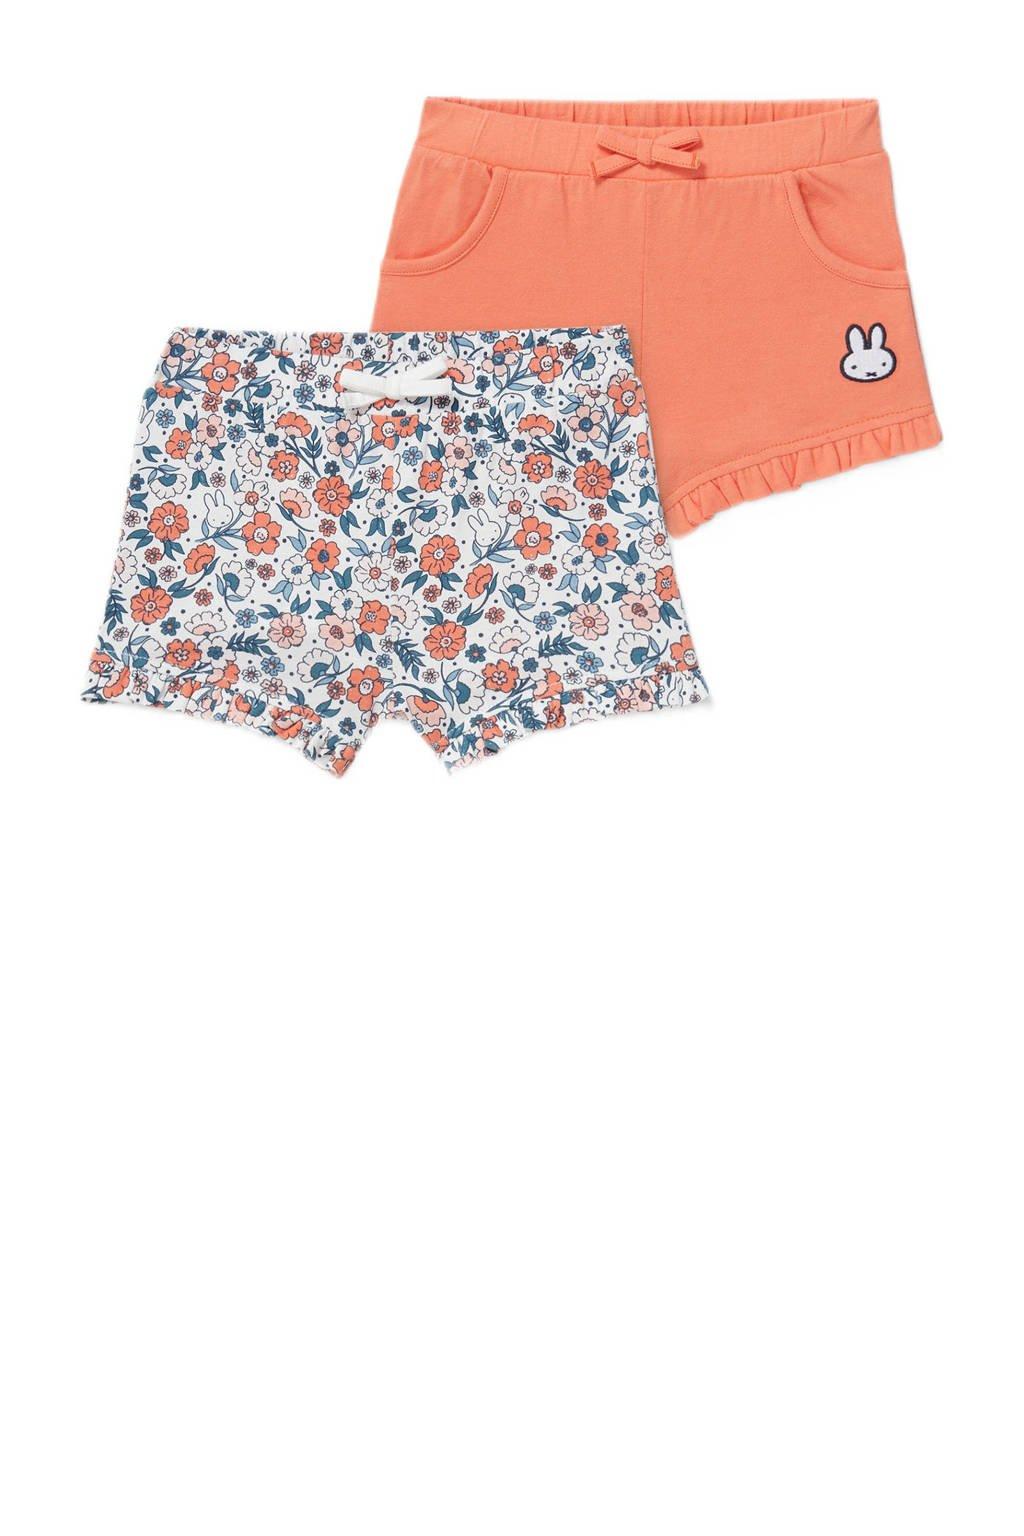 C&A korte broek - set van 2 oranje/blauw/wit, Oranje/blauw/wit